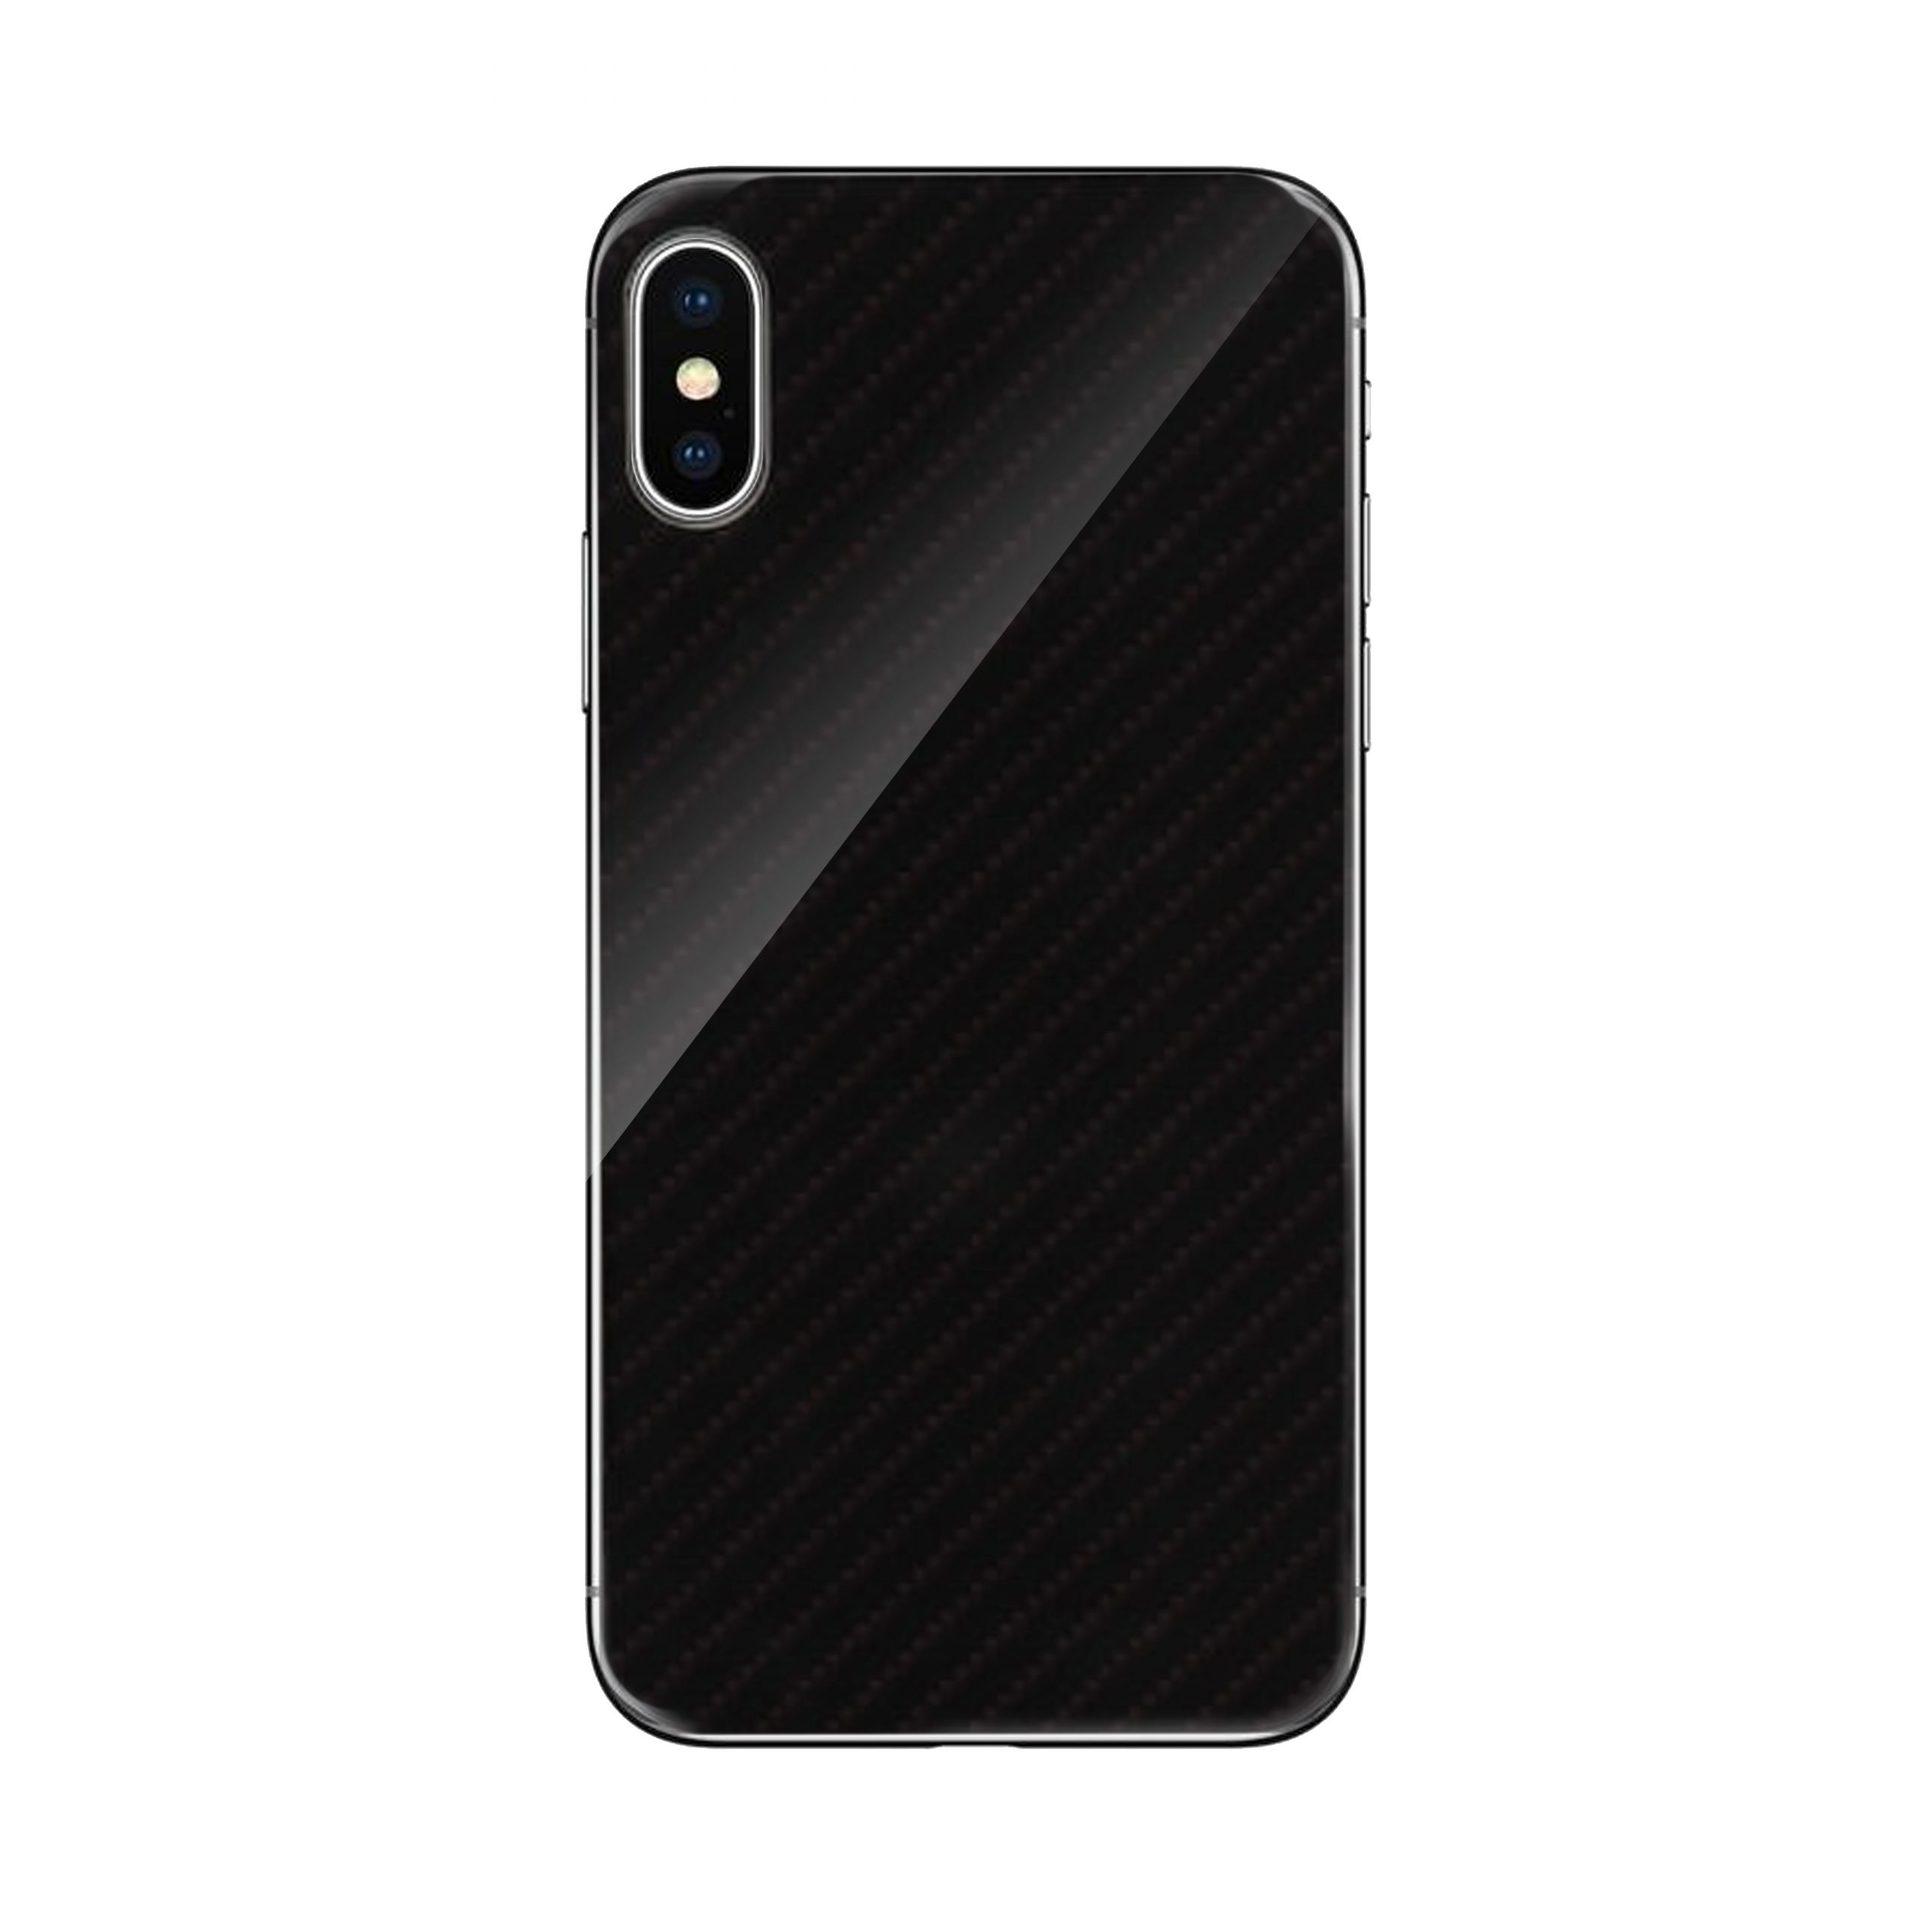 Etui do Iphone X/XS eleganckie czarne szklane